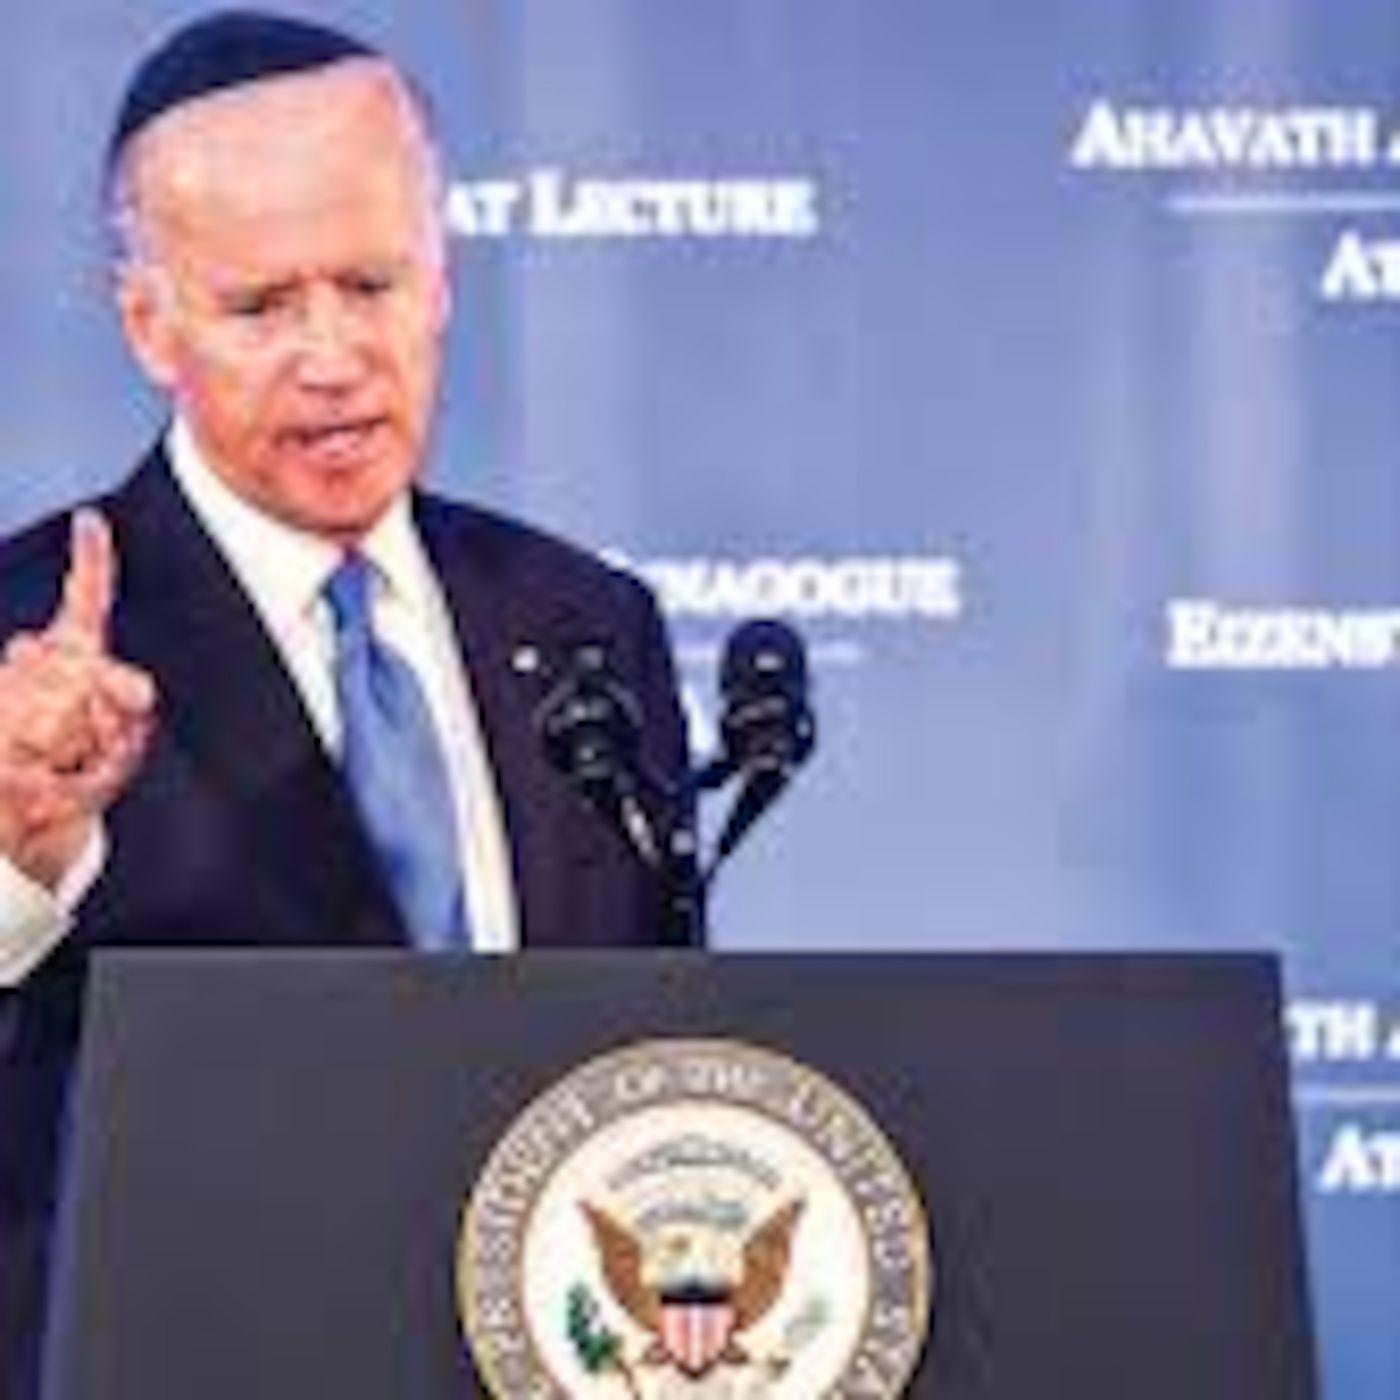 Episode 846: Joe Biden and the Jews